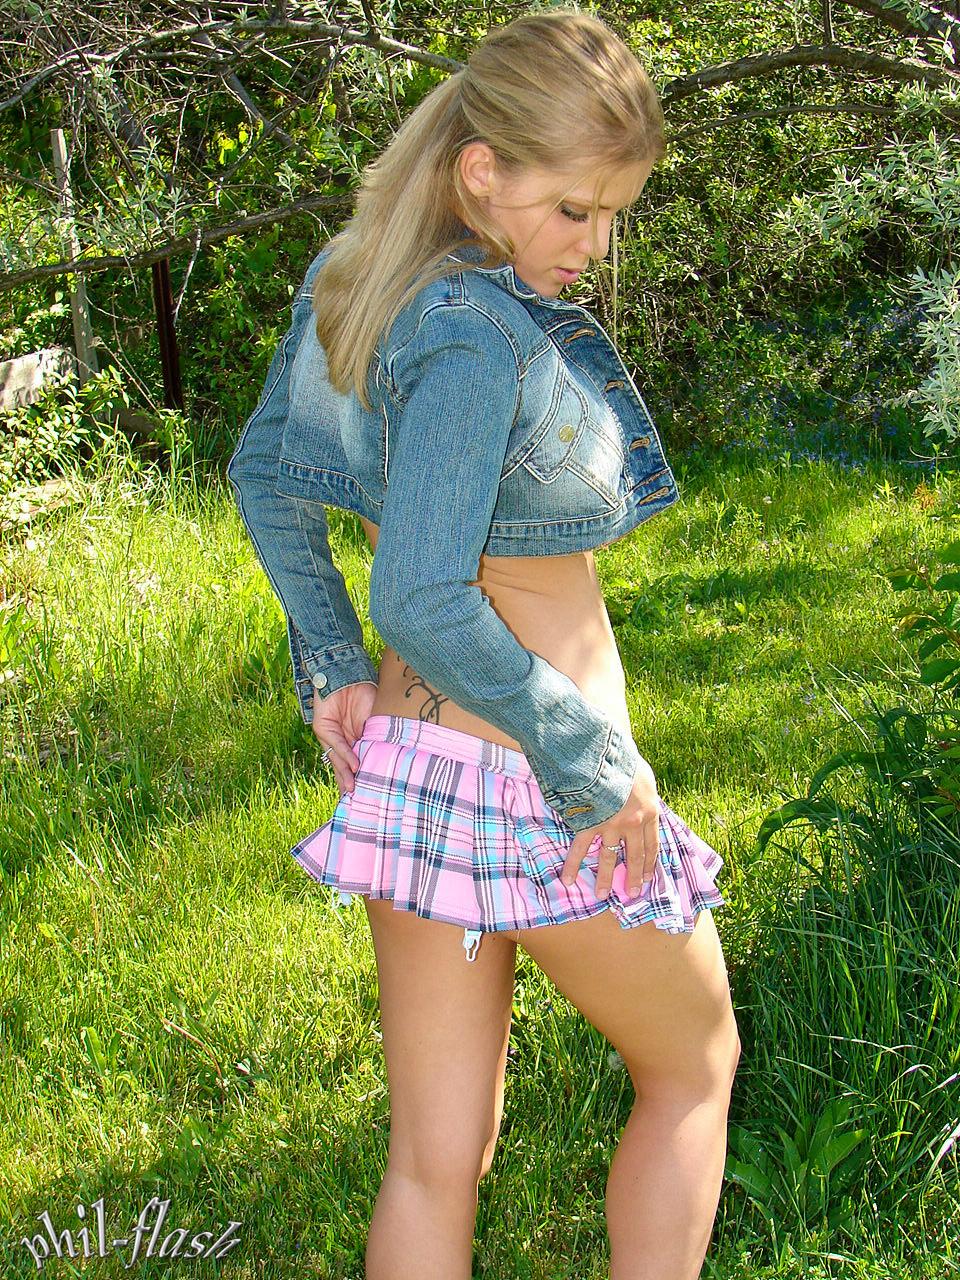 Blonde girl outdoors in a miniskirt